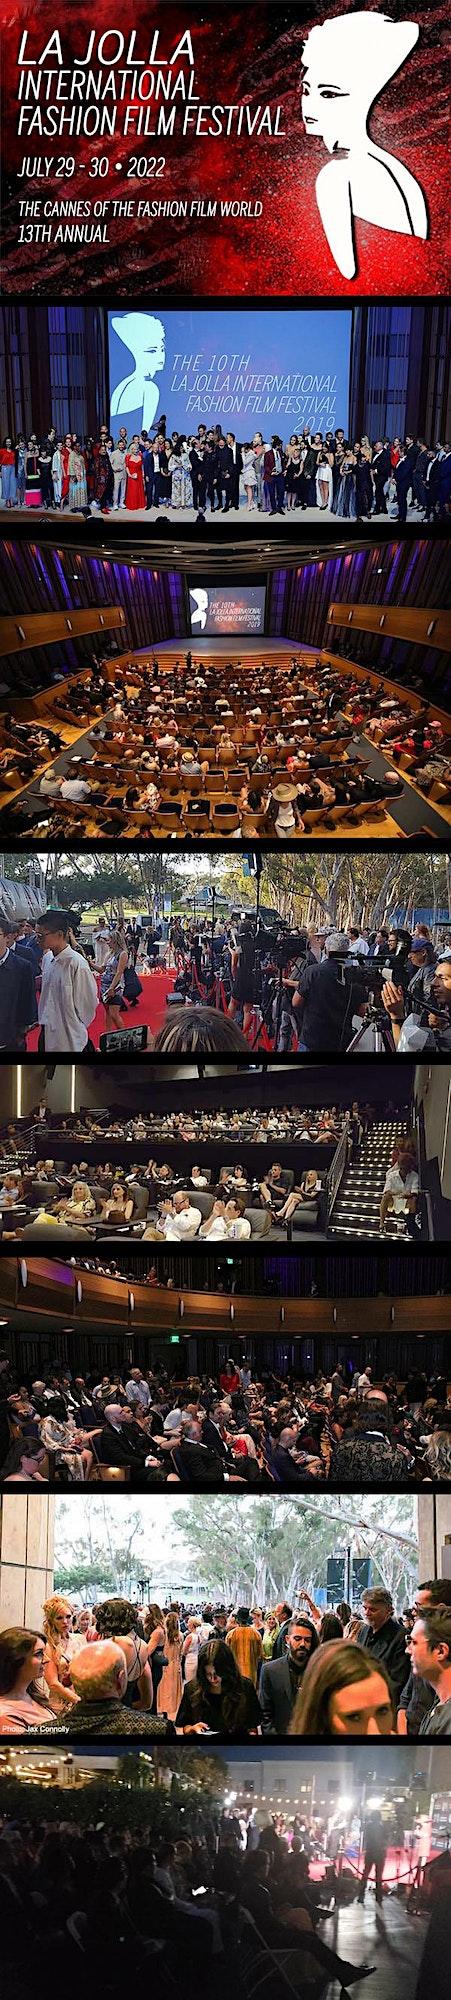 The 13th La Jolla International Fashion Film Festival image